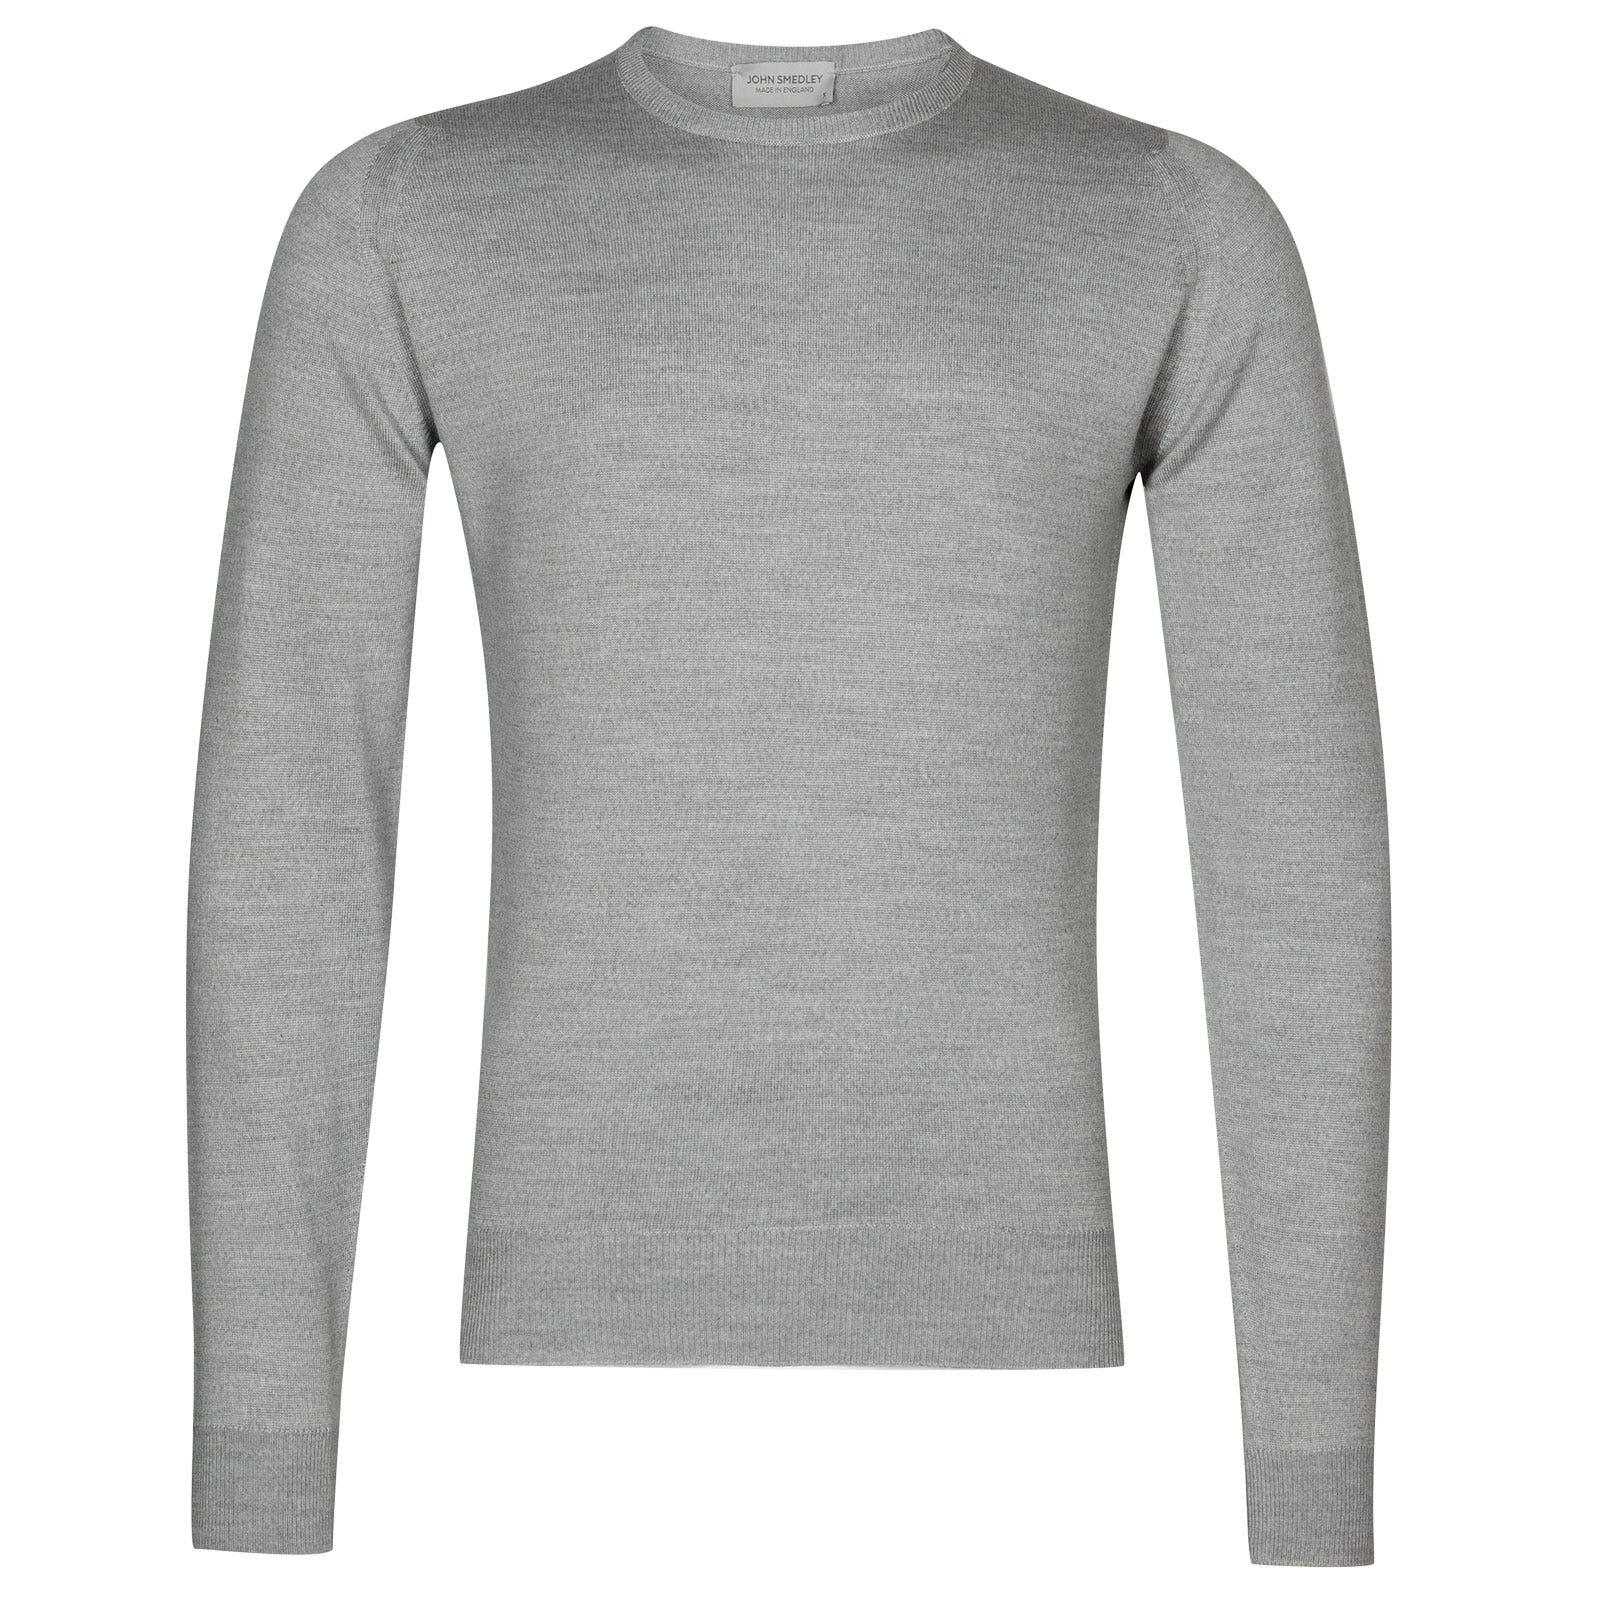 John Smedley farhill Merino Wool Pullover in Bardot Grey-XXL